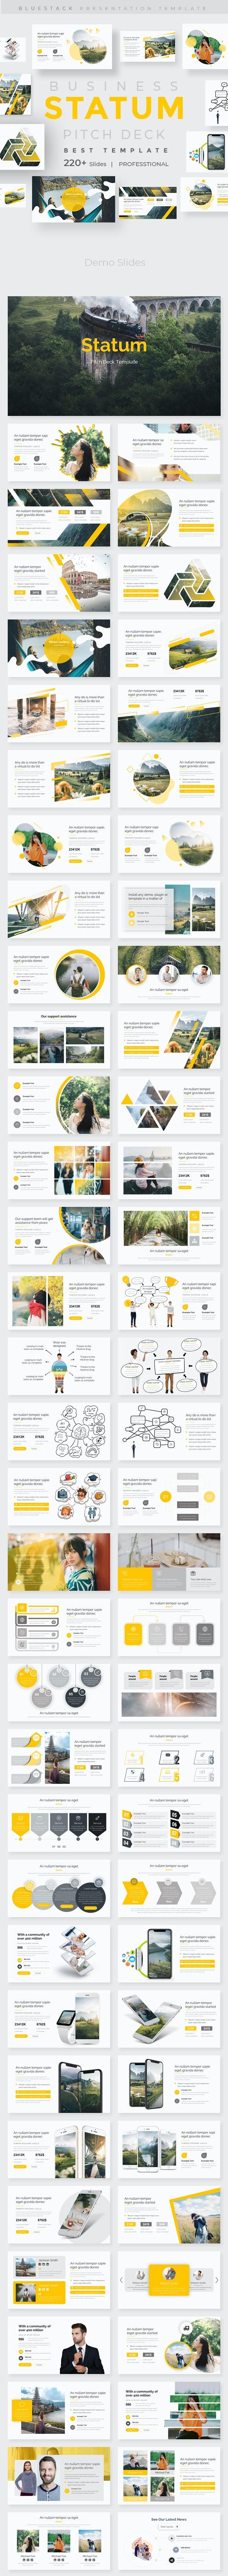 Statum Pitch Deck Powerpoint Template - Creative PowerPoint Templates